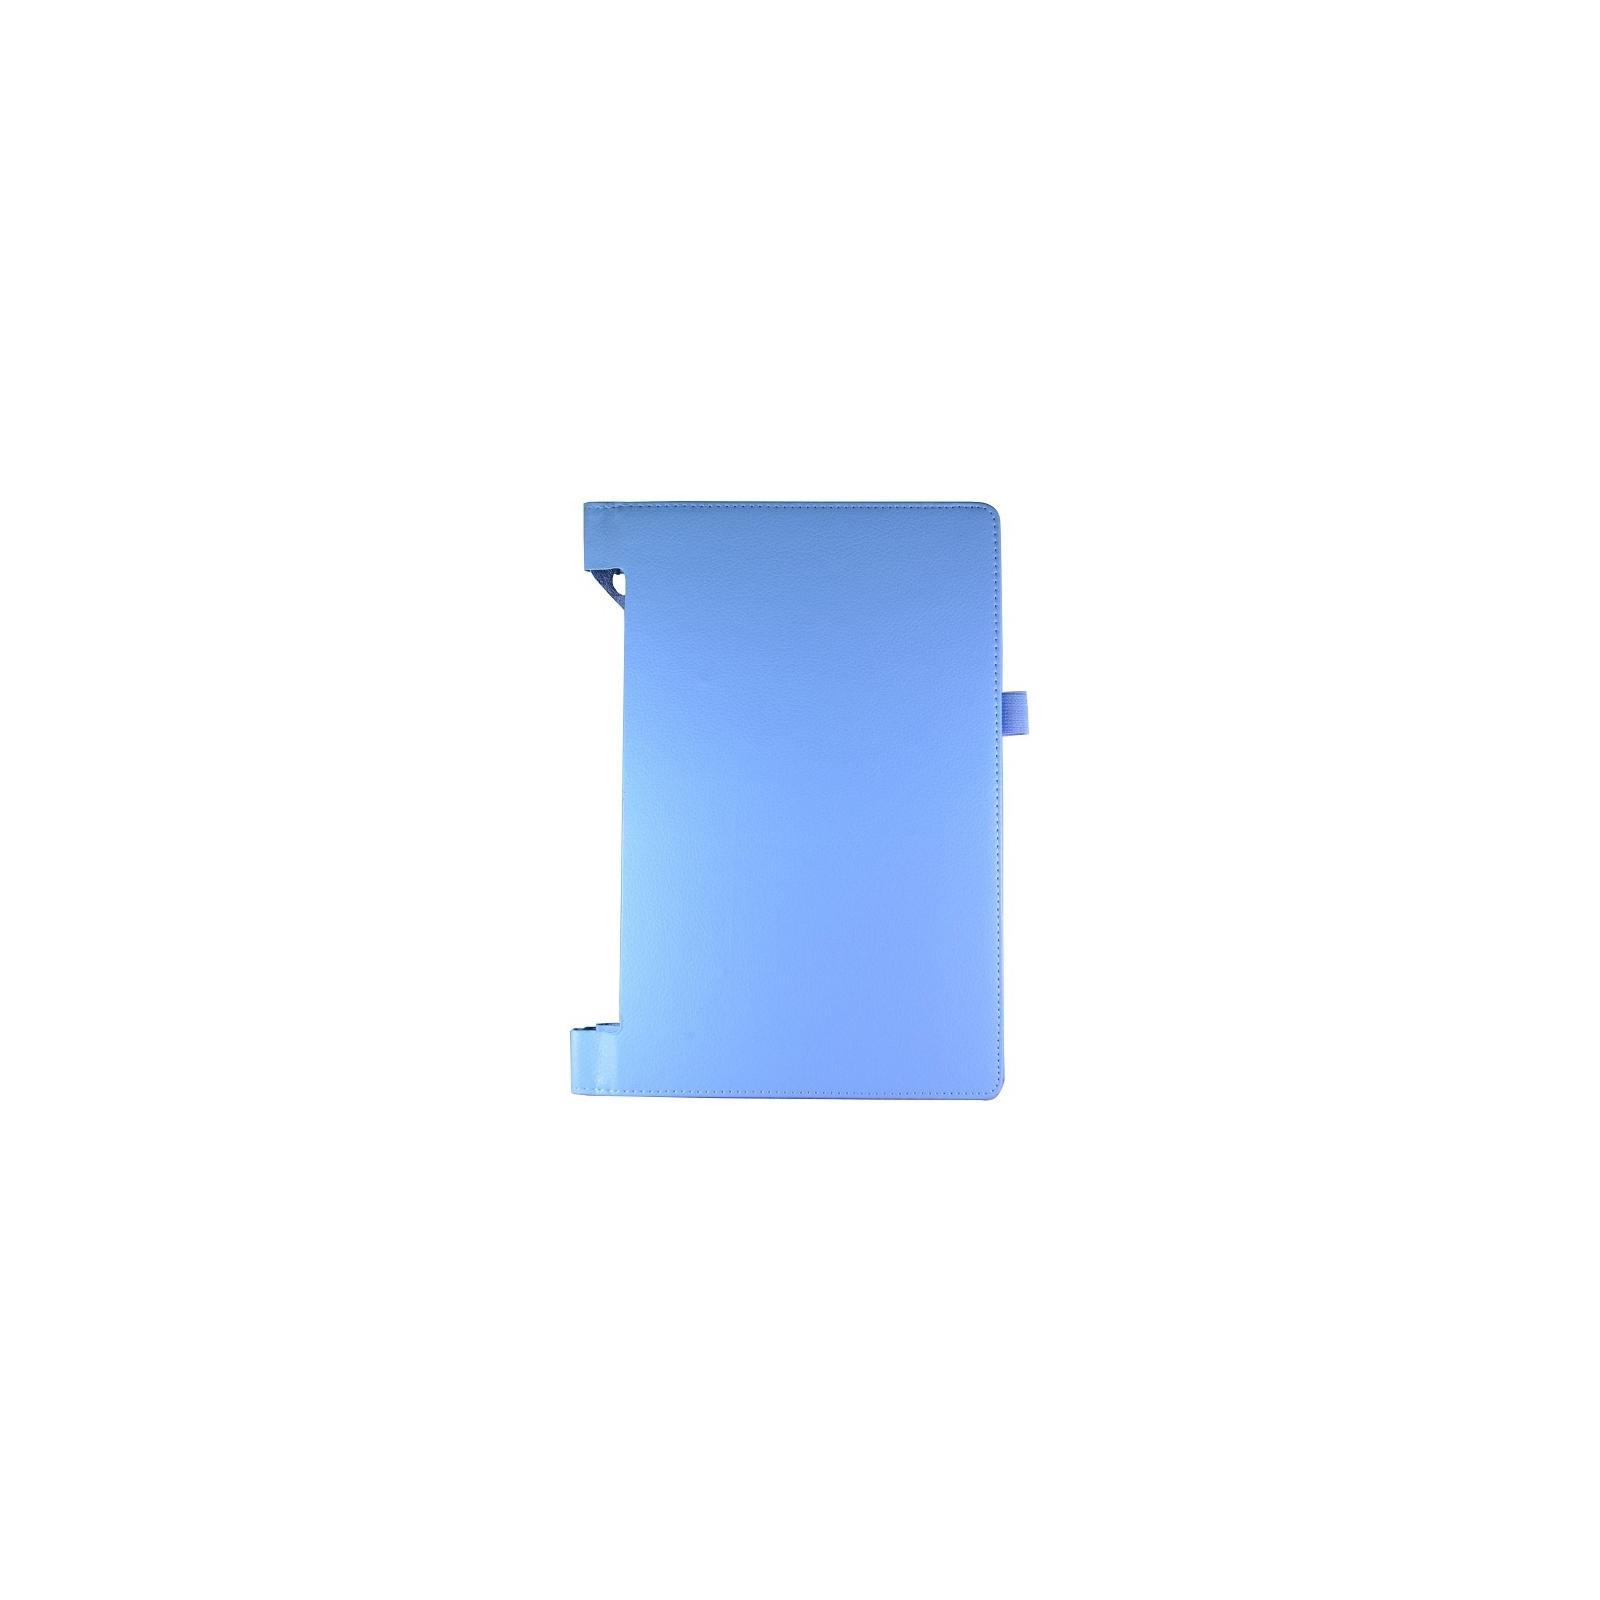 "Чехол для планшета Pro-case 10,1"" Pro-case Lenovo B8080 blue (B8080blue)"